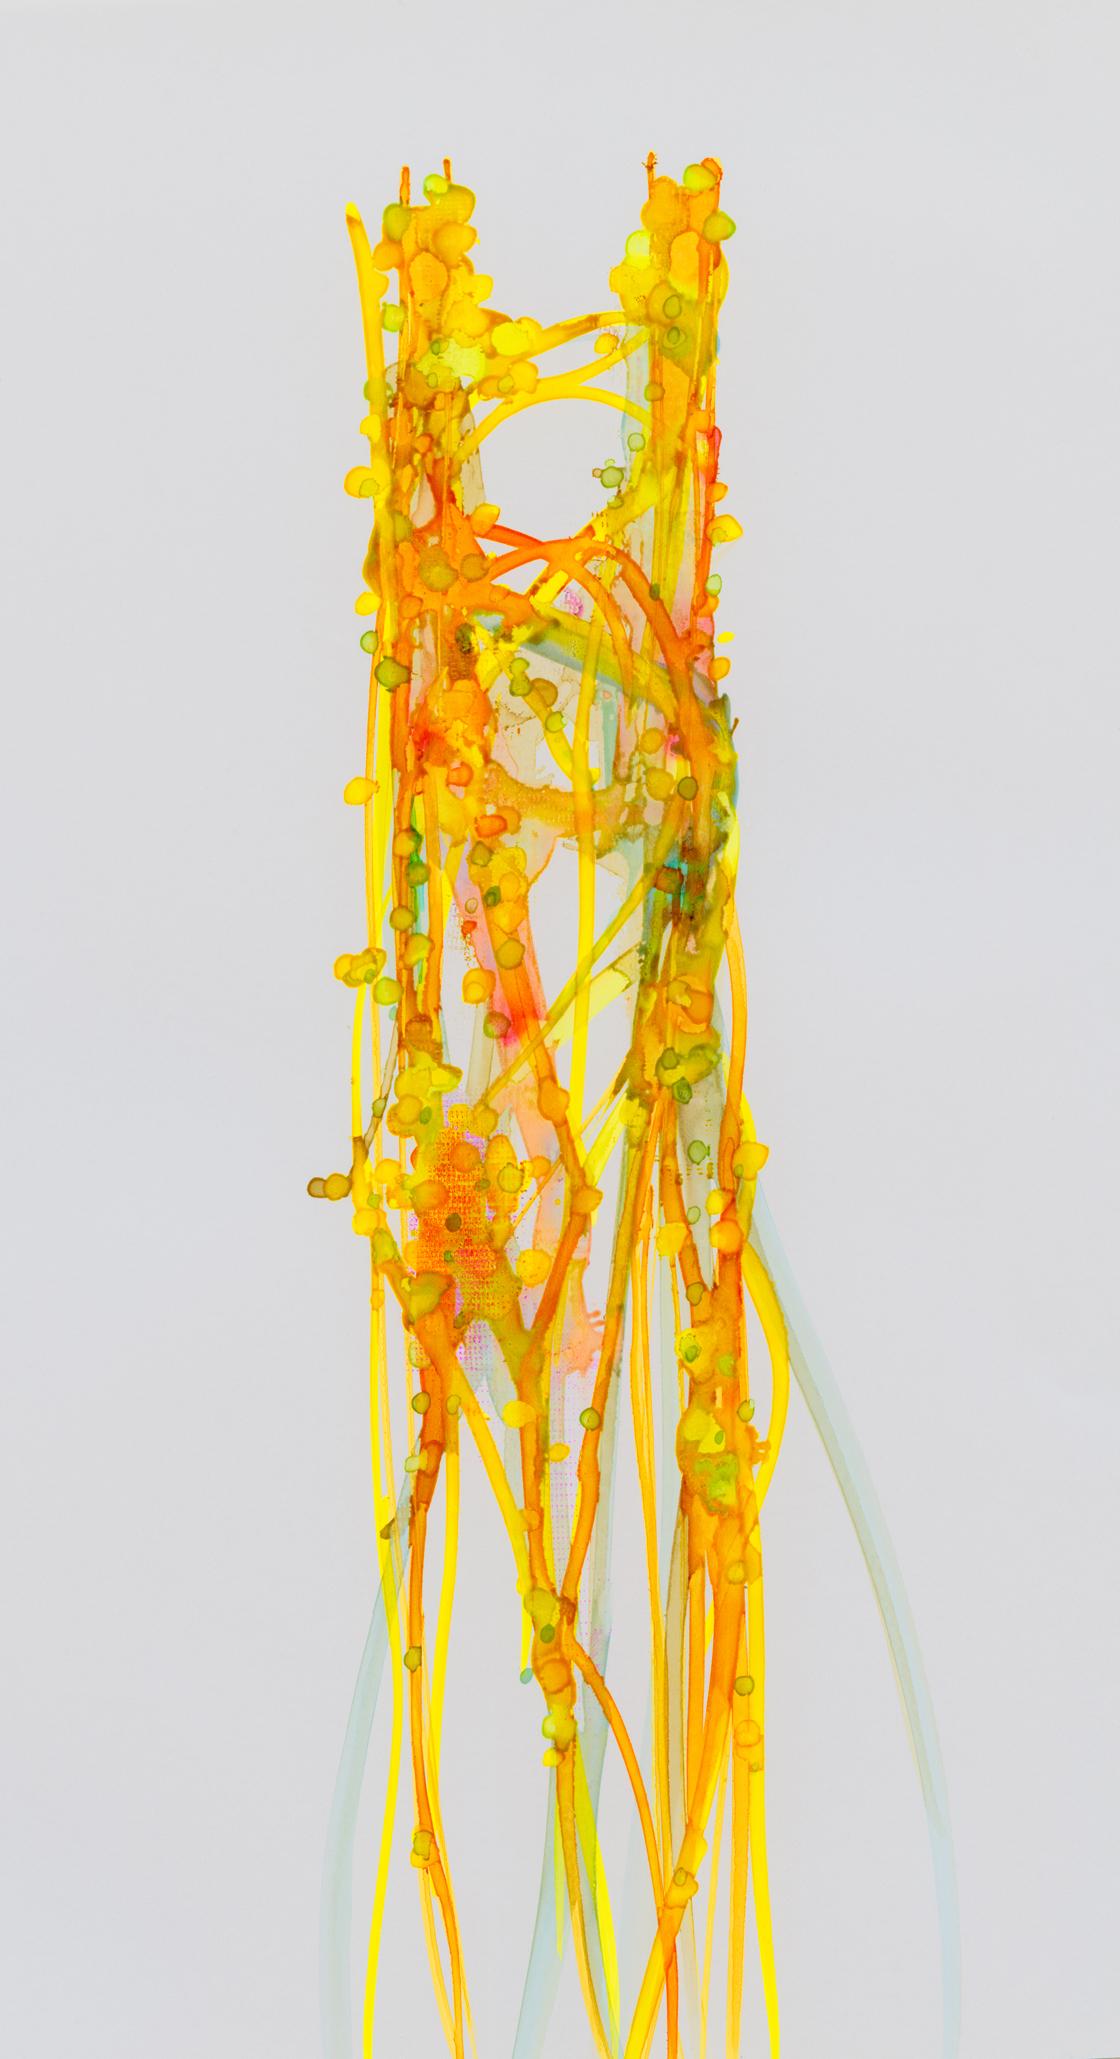 "'Tower', 44"" x 23"" - Curtis Cutshaw at Kostuik Gallery"